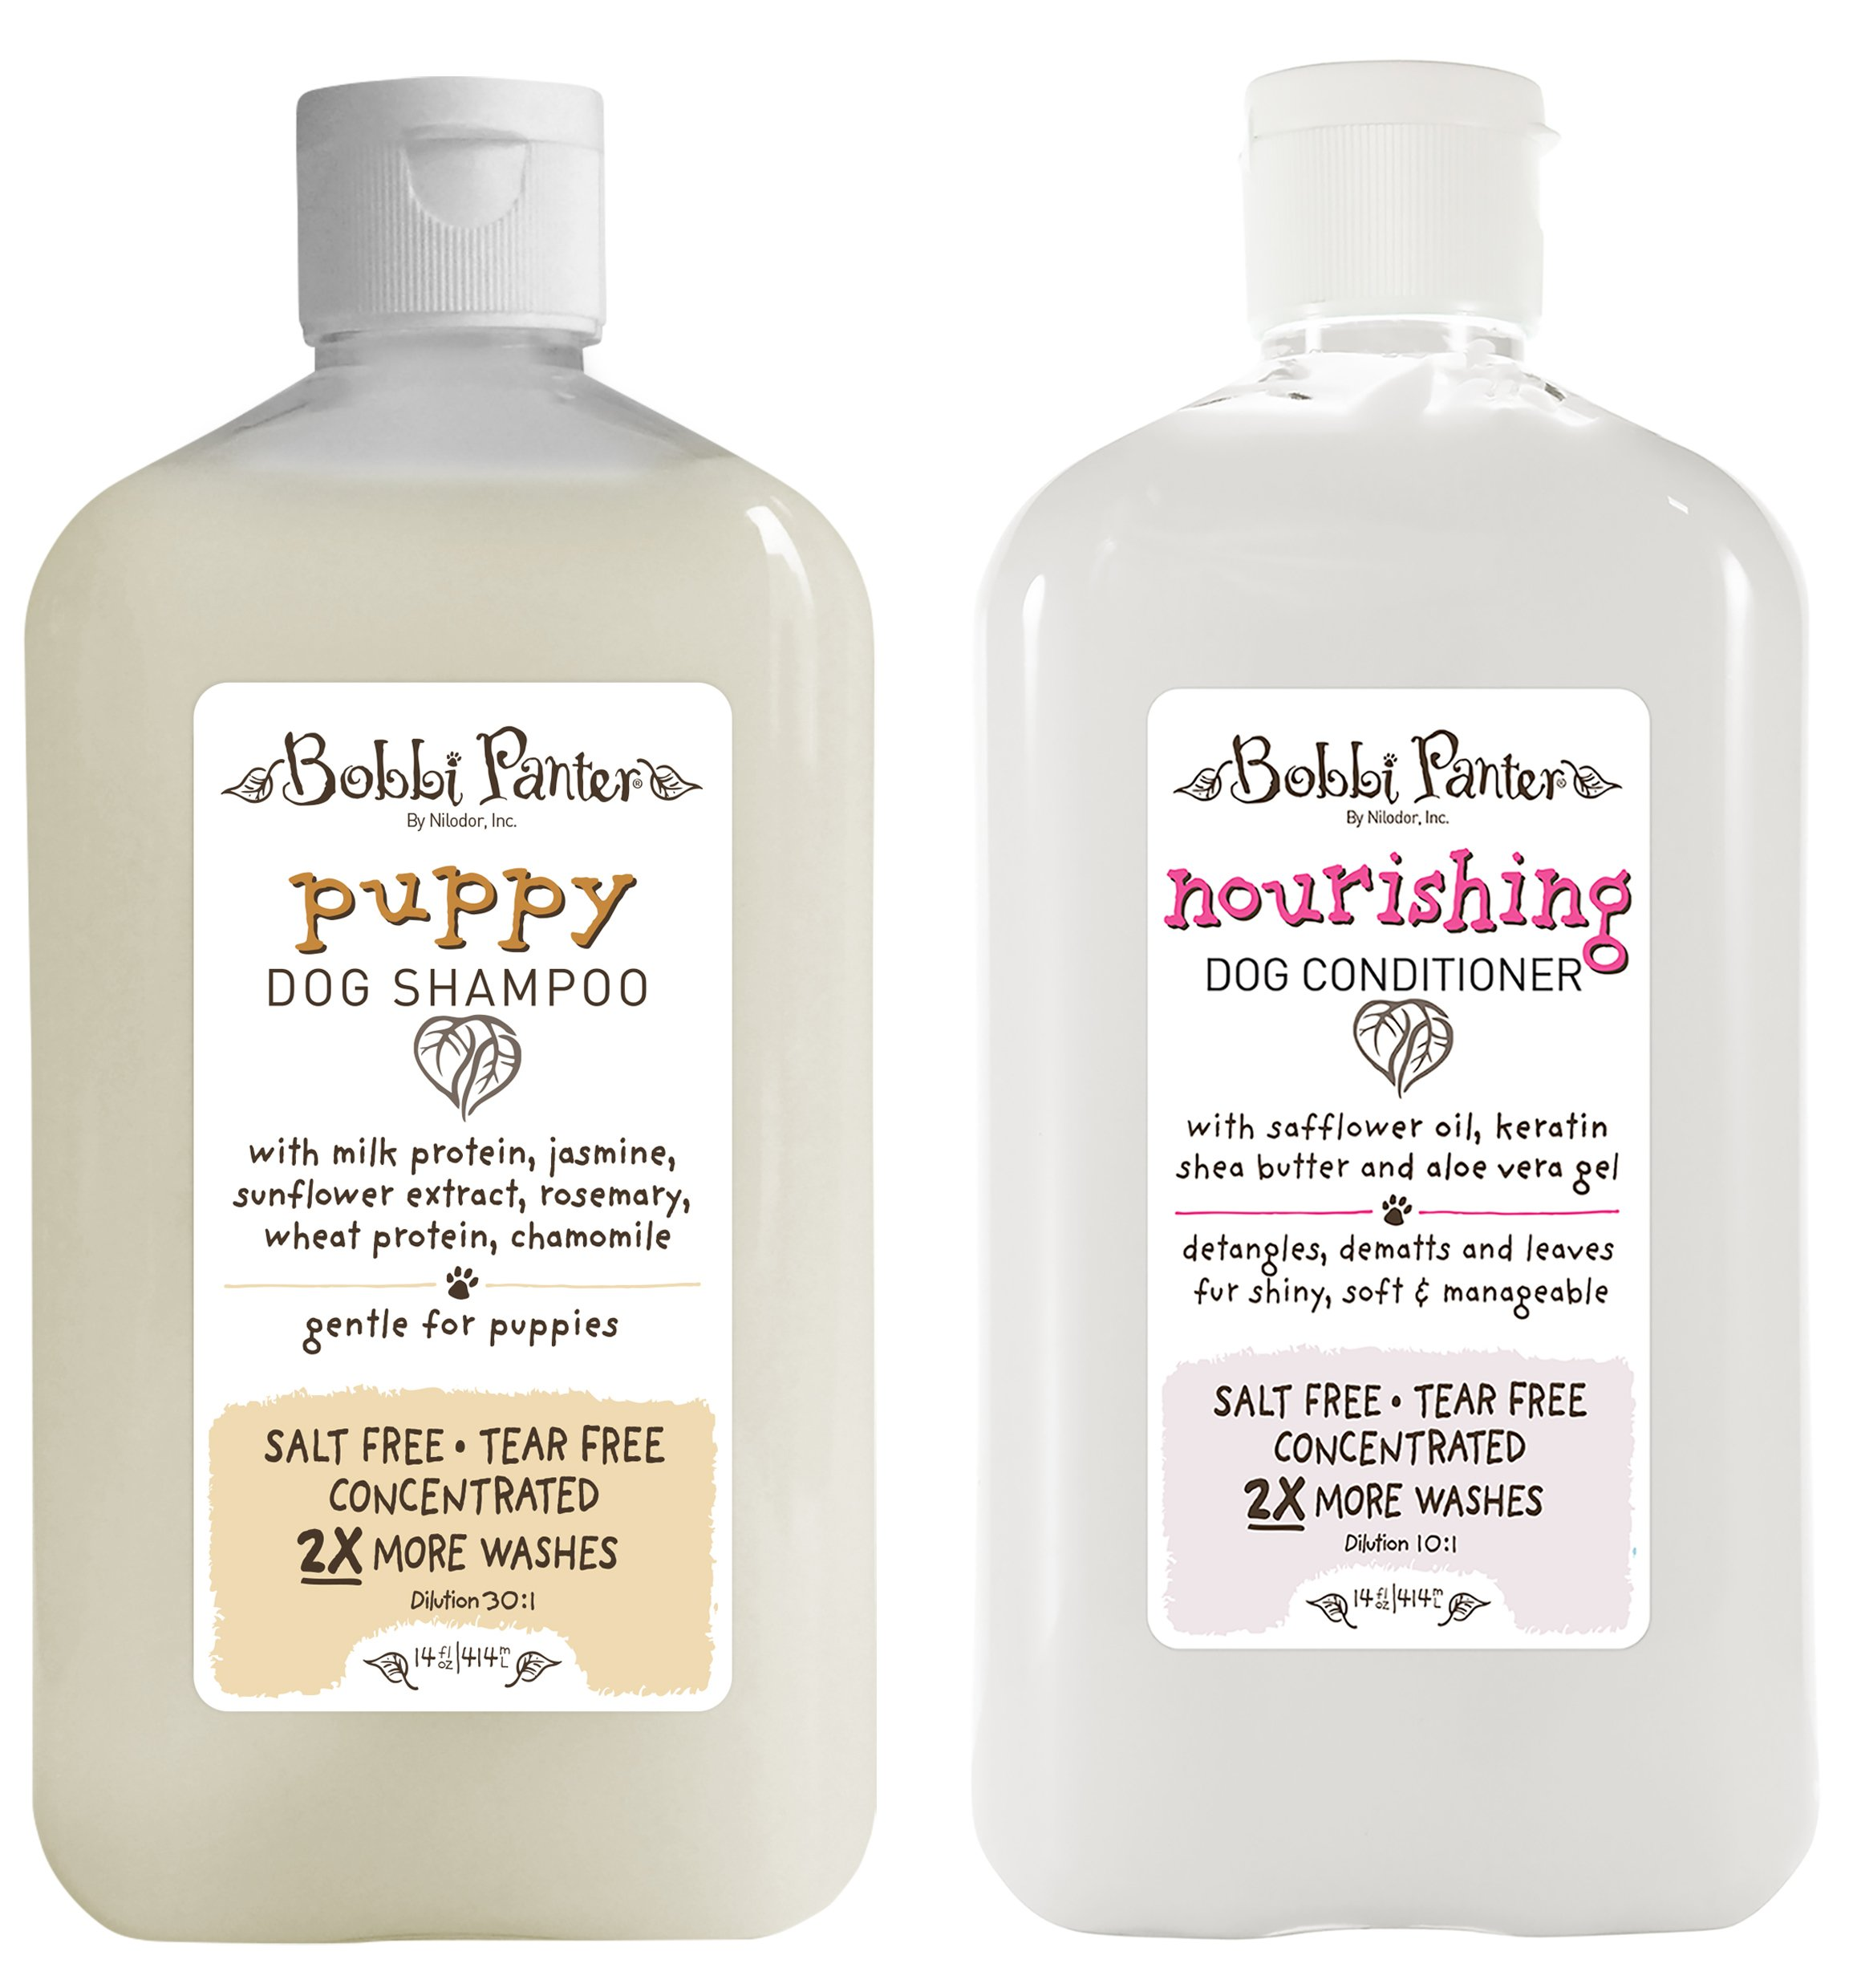 Bobbi Panter Natural Puppy Dog Shampoo and Nourishing Conditioner by Bobbi Panter